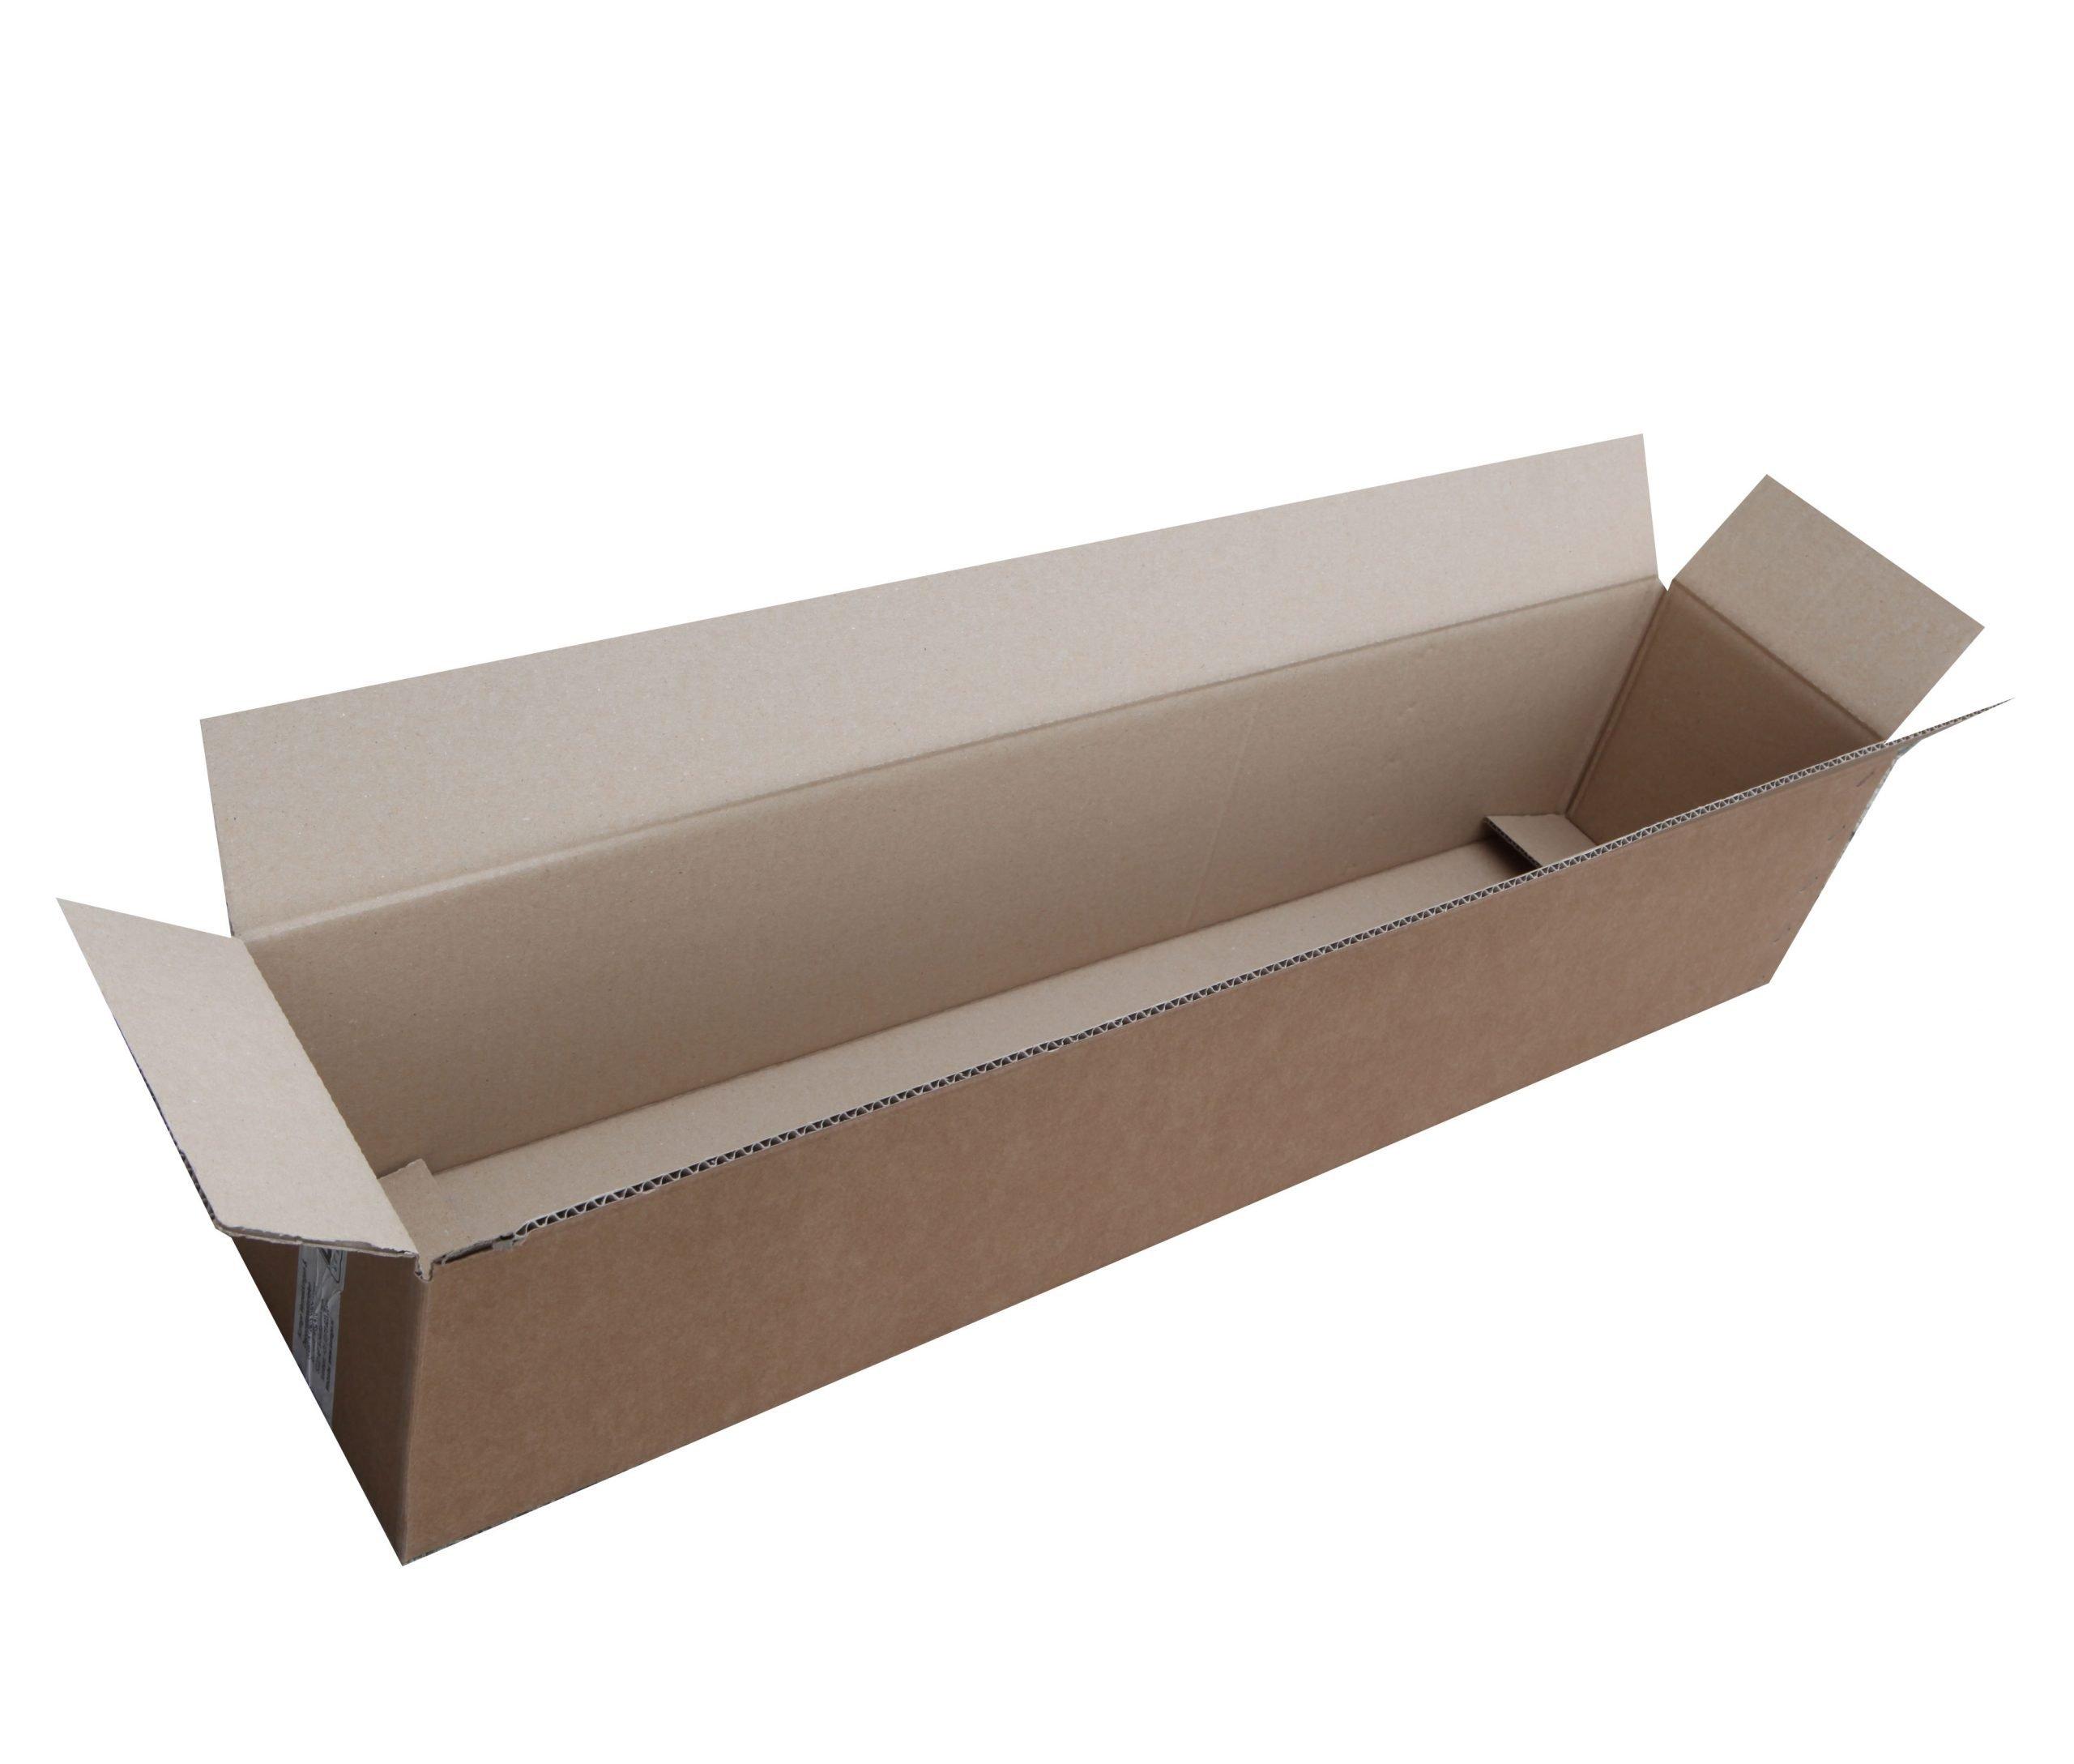 Longbox-doos 1000x150x150mm.